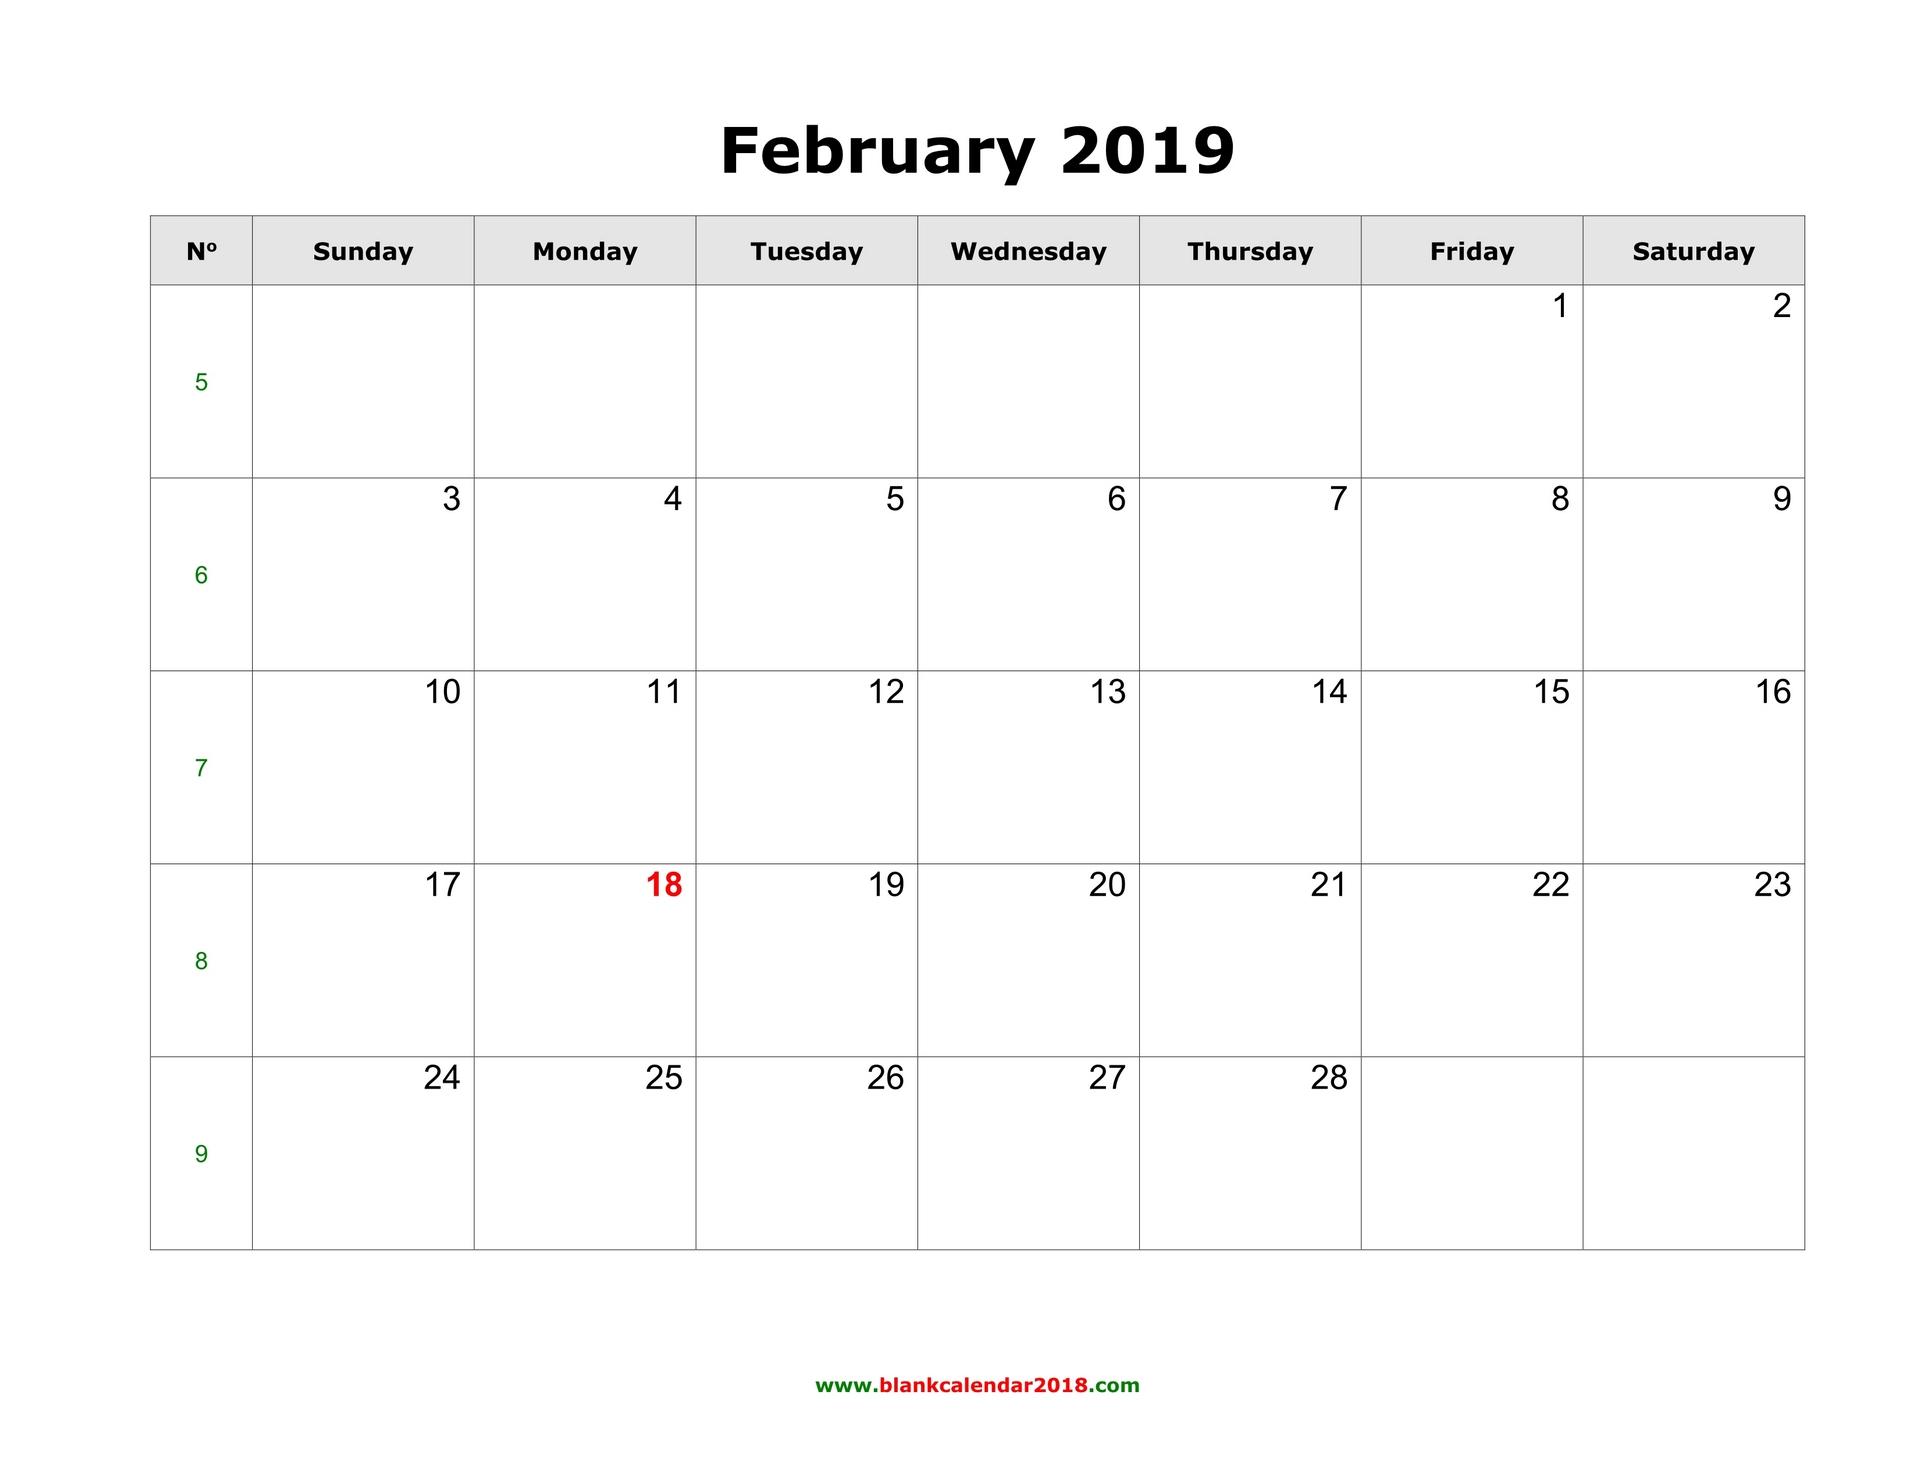 Blank Calendar For February 2019 regarding Blank Calendar With Only Weekdays